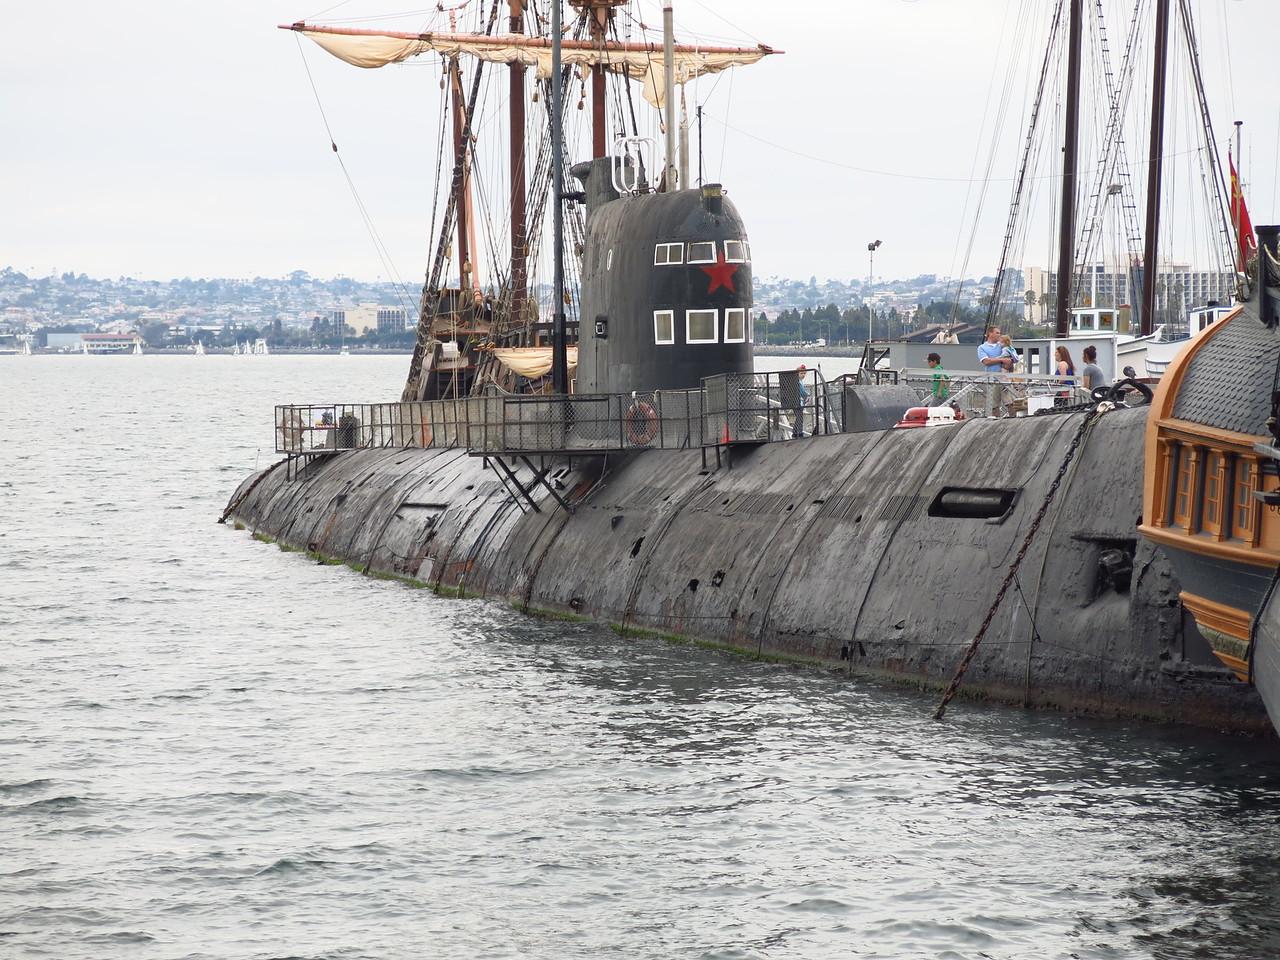 2016-06-07 Maritime (108)